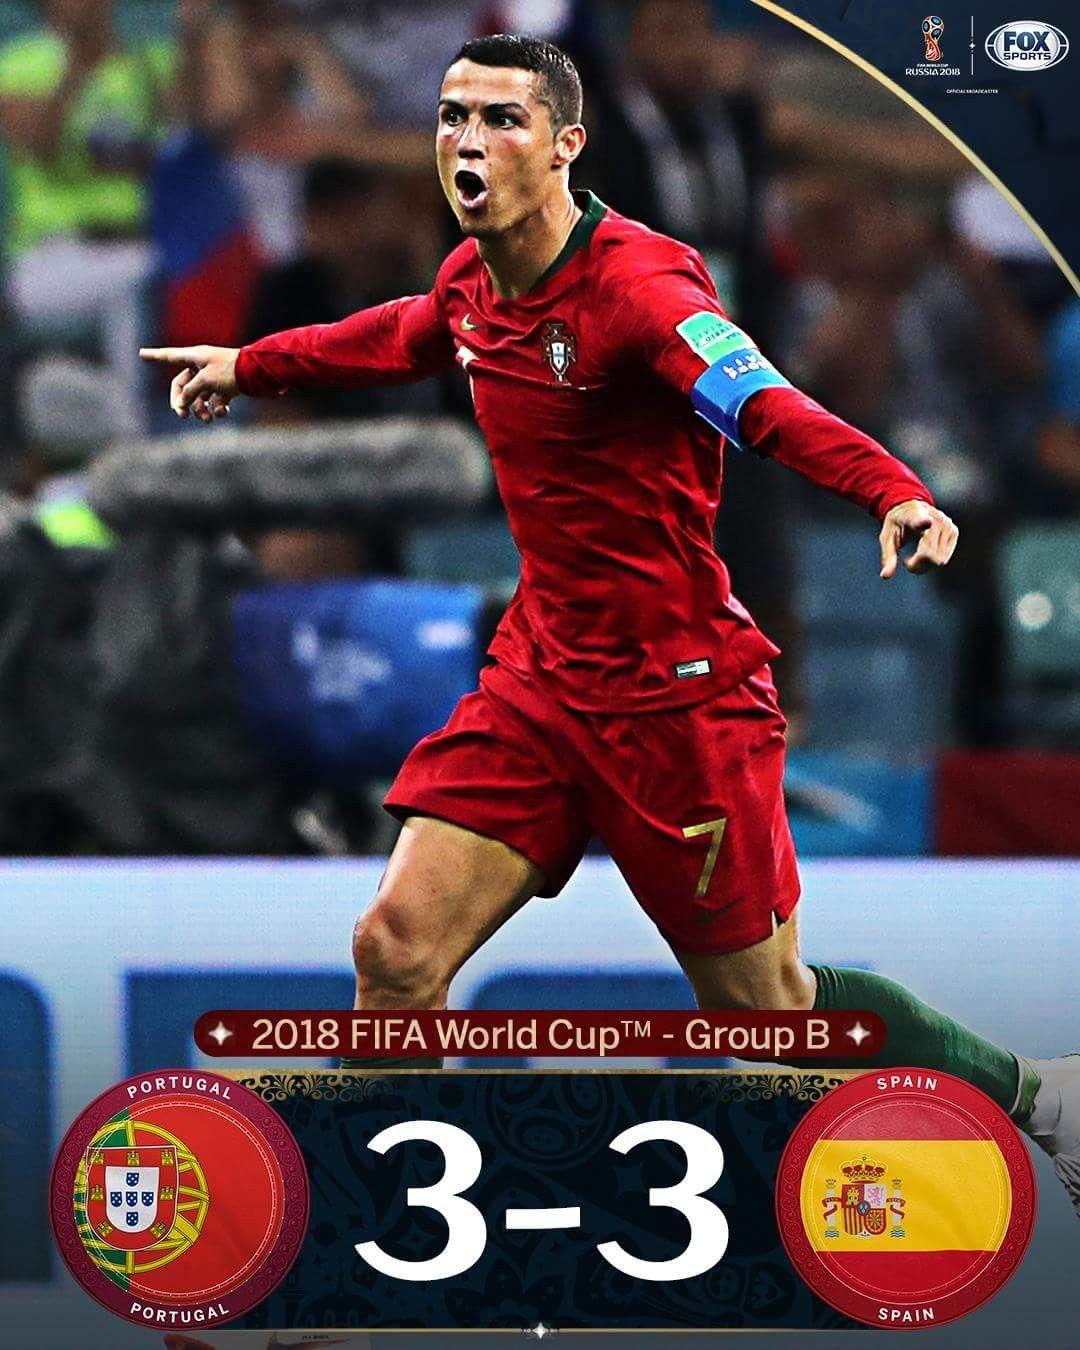 Pin By Raimundo Martins On Futebol Spain Soccer Portugal Vs Spain Fifa